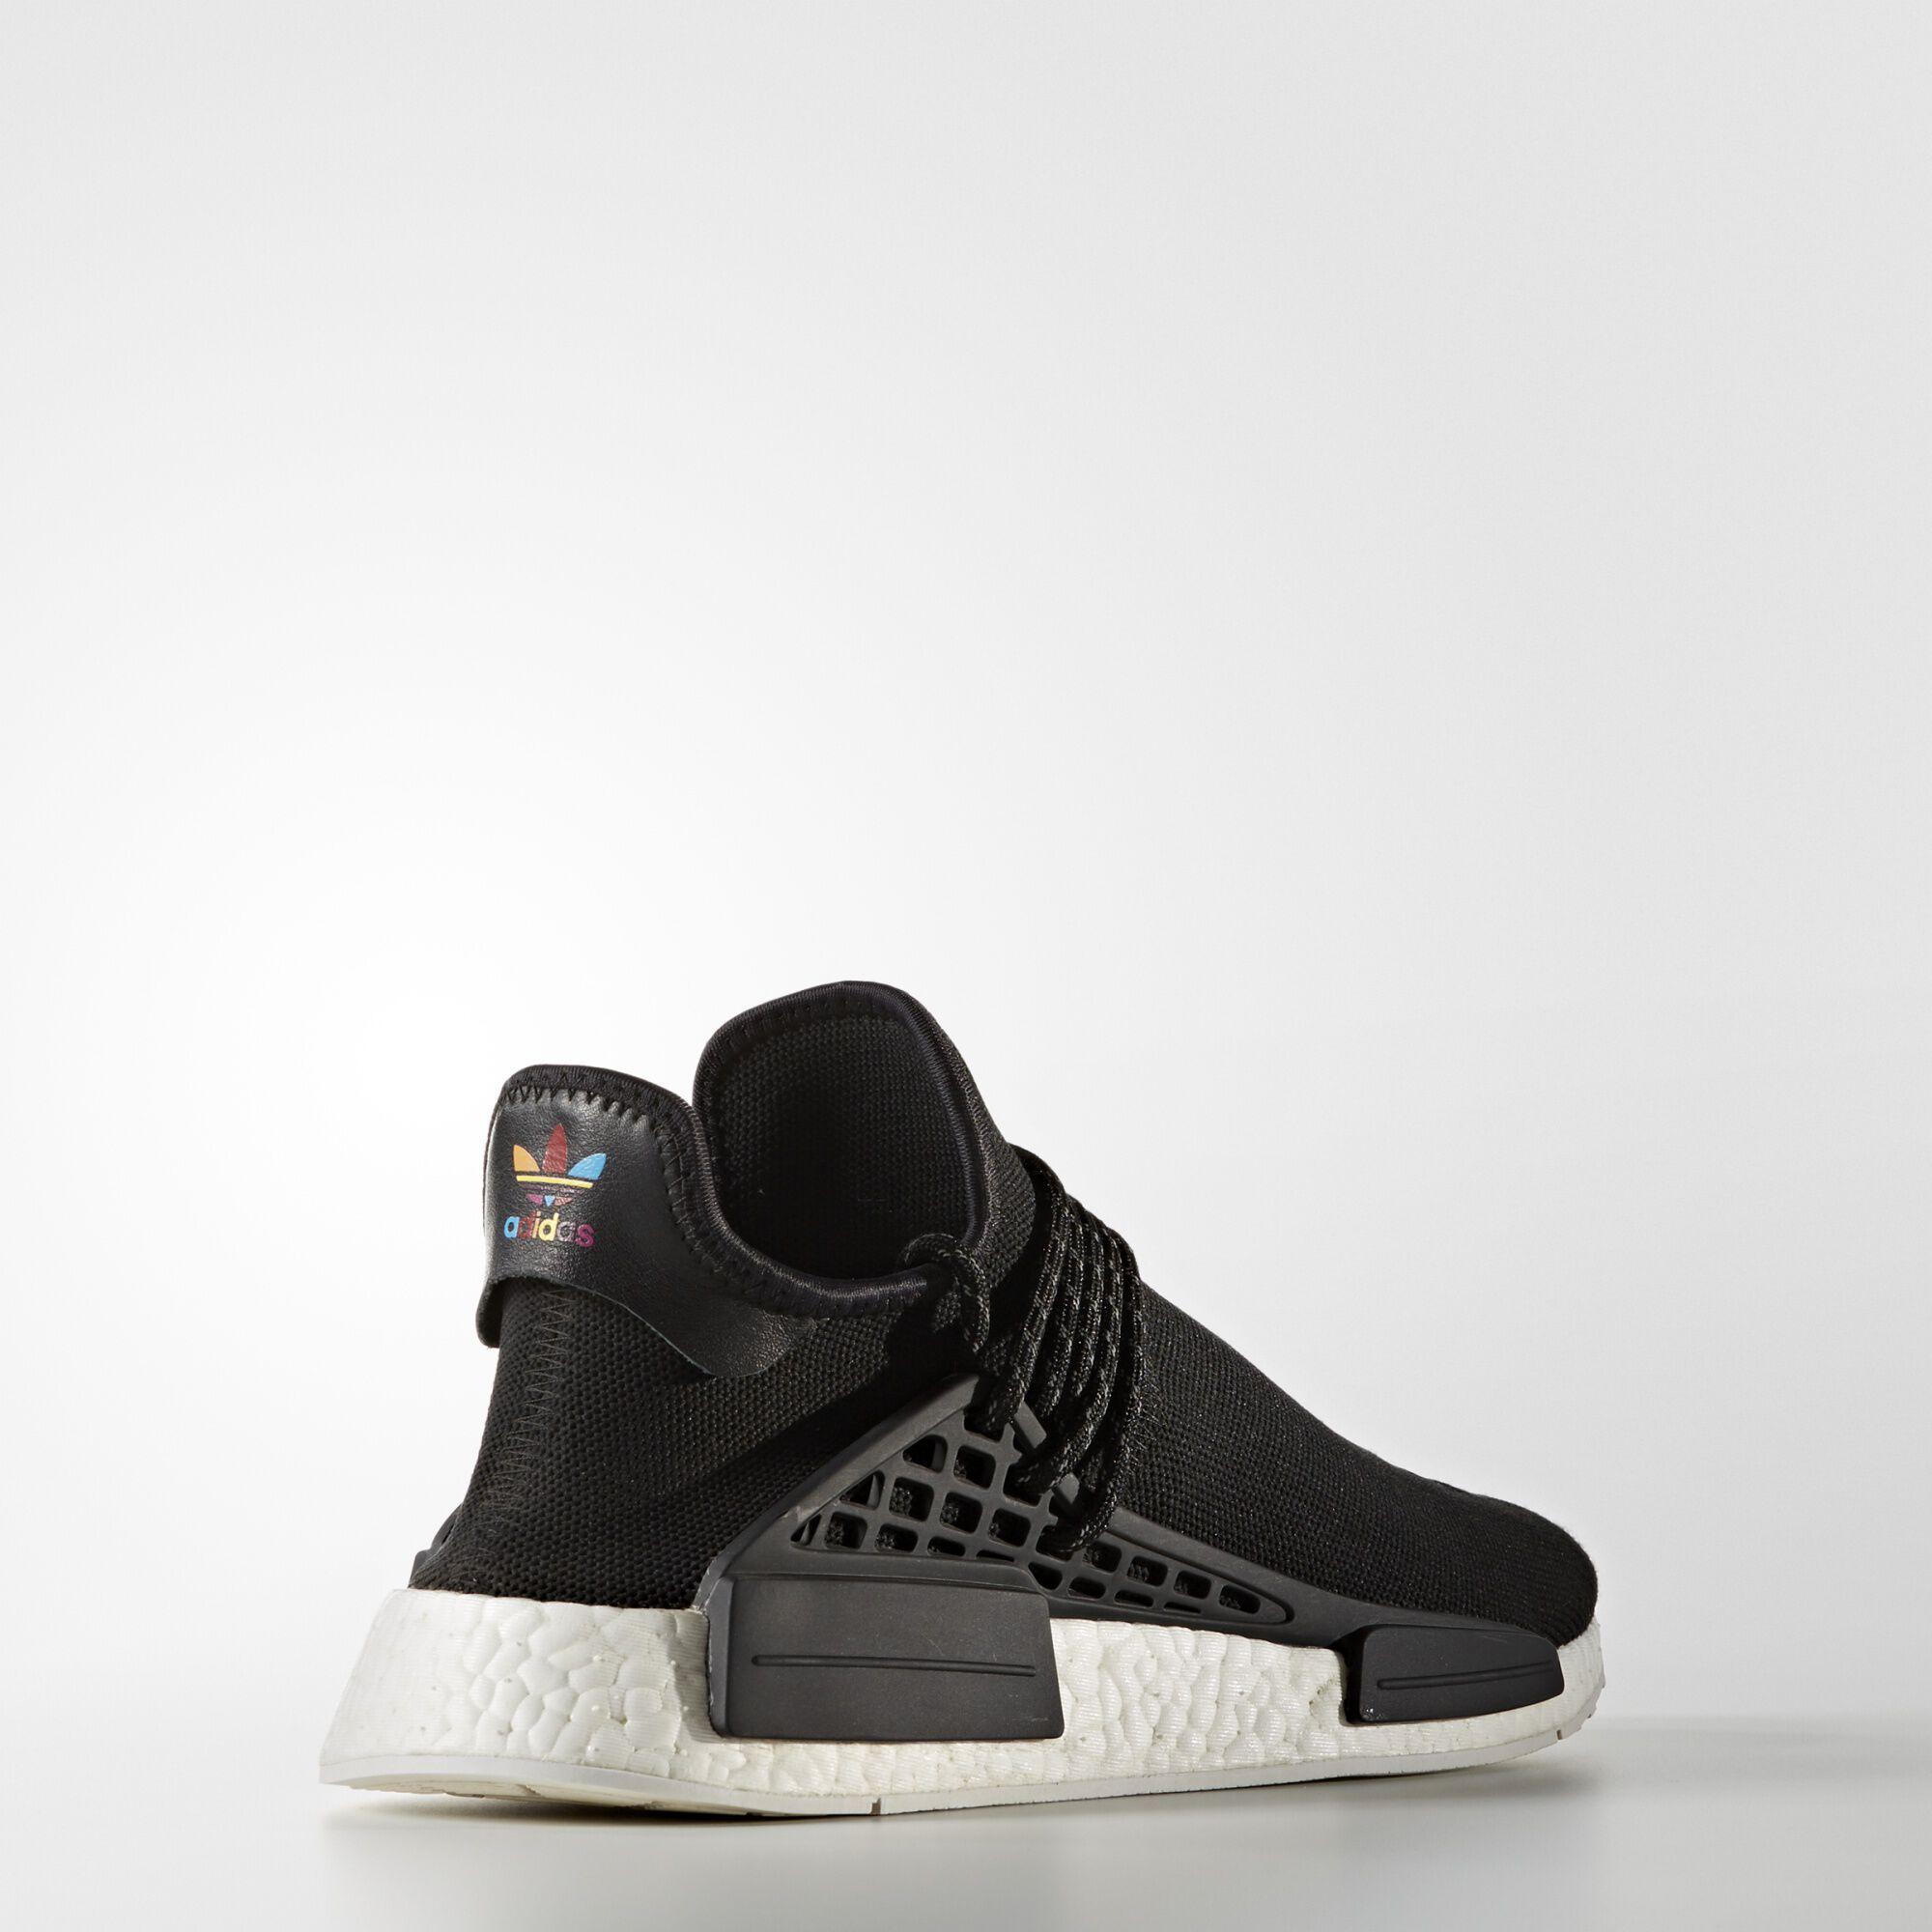 fa6aca43e adidas  Pharrell x NMD  Human Race  CW  Core Black Core Black Core Black  SKU  BB3068 Release  09.29.16. Retail   240